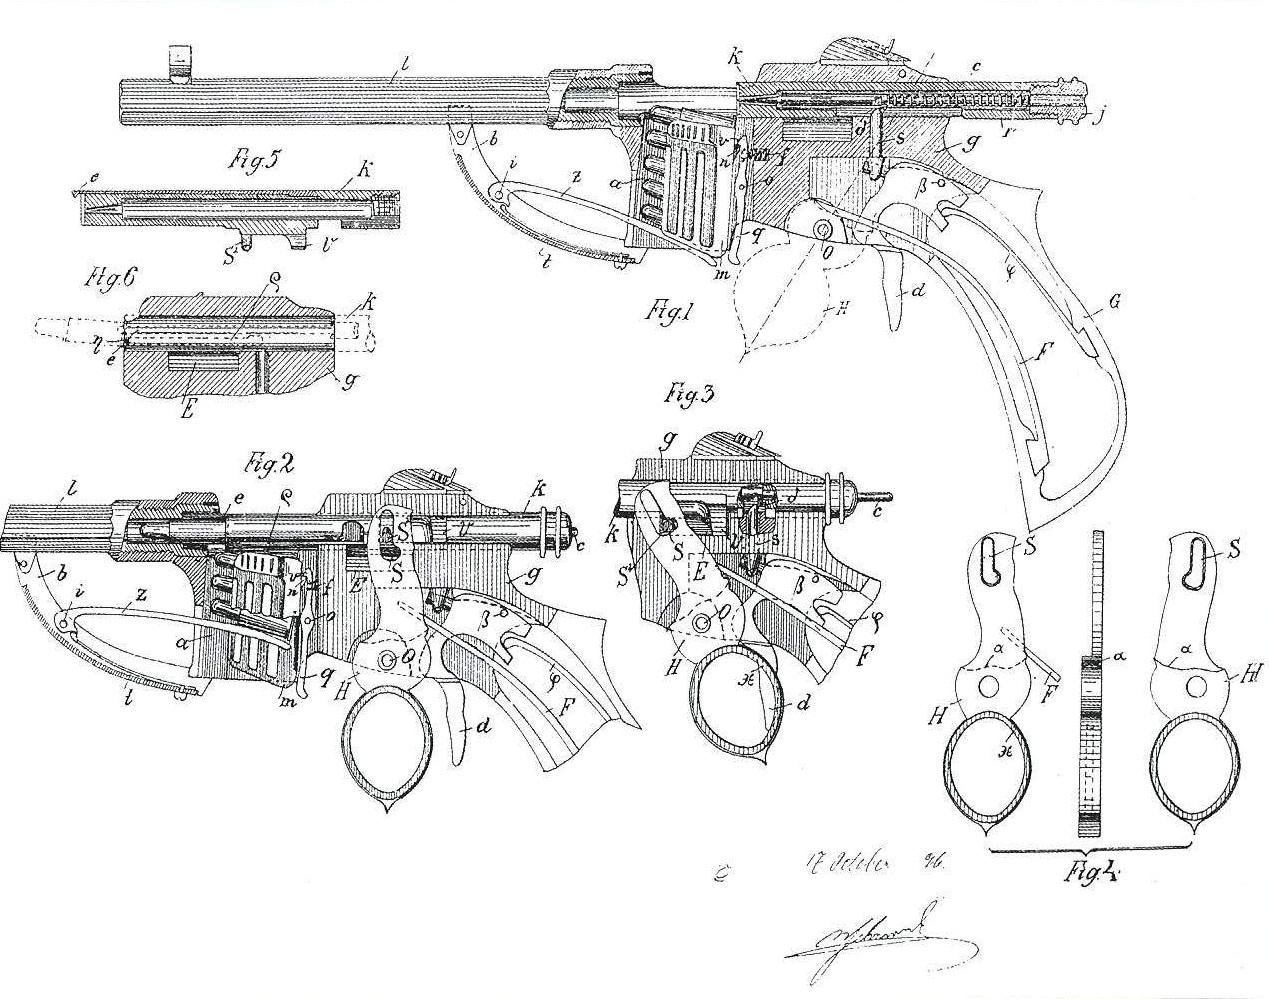 Bittner repeating pistol patent